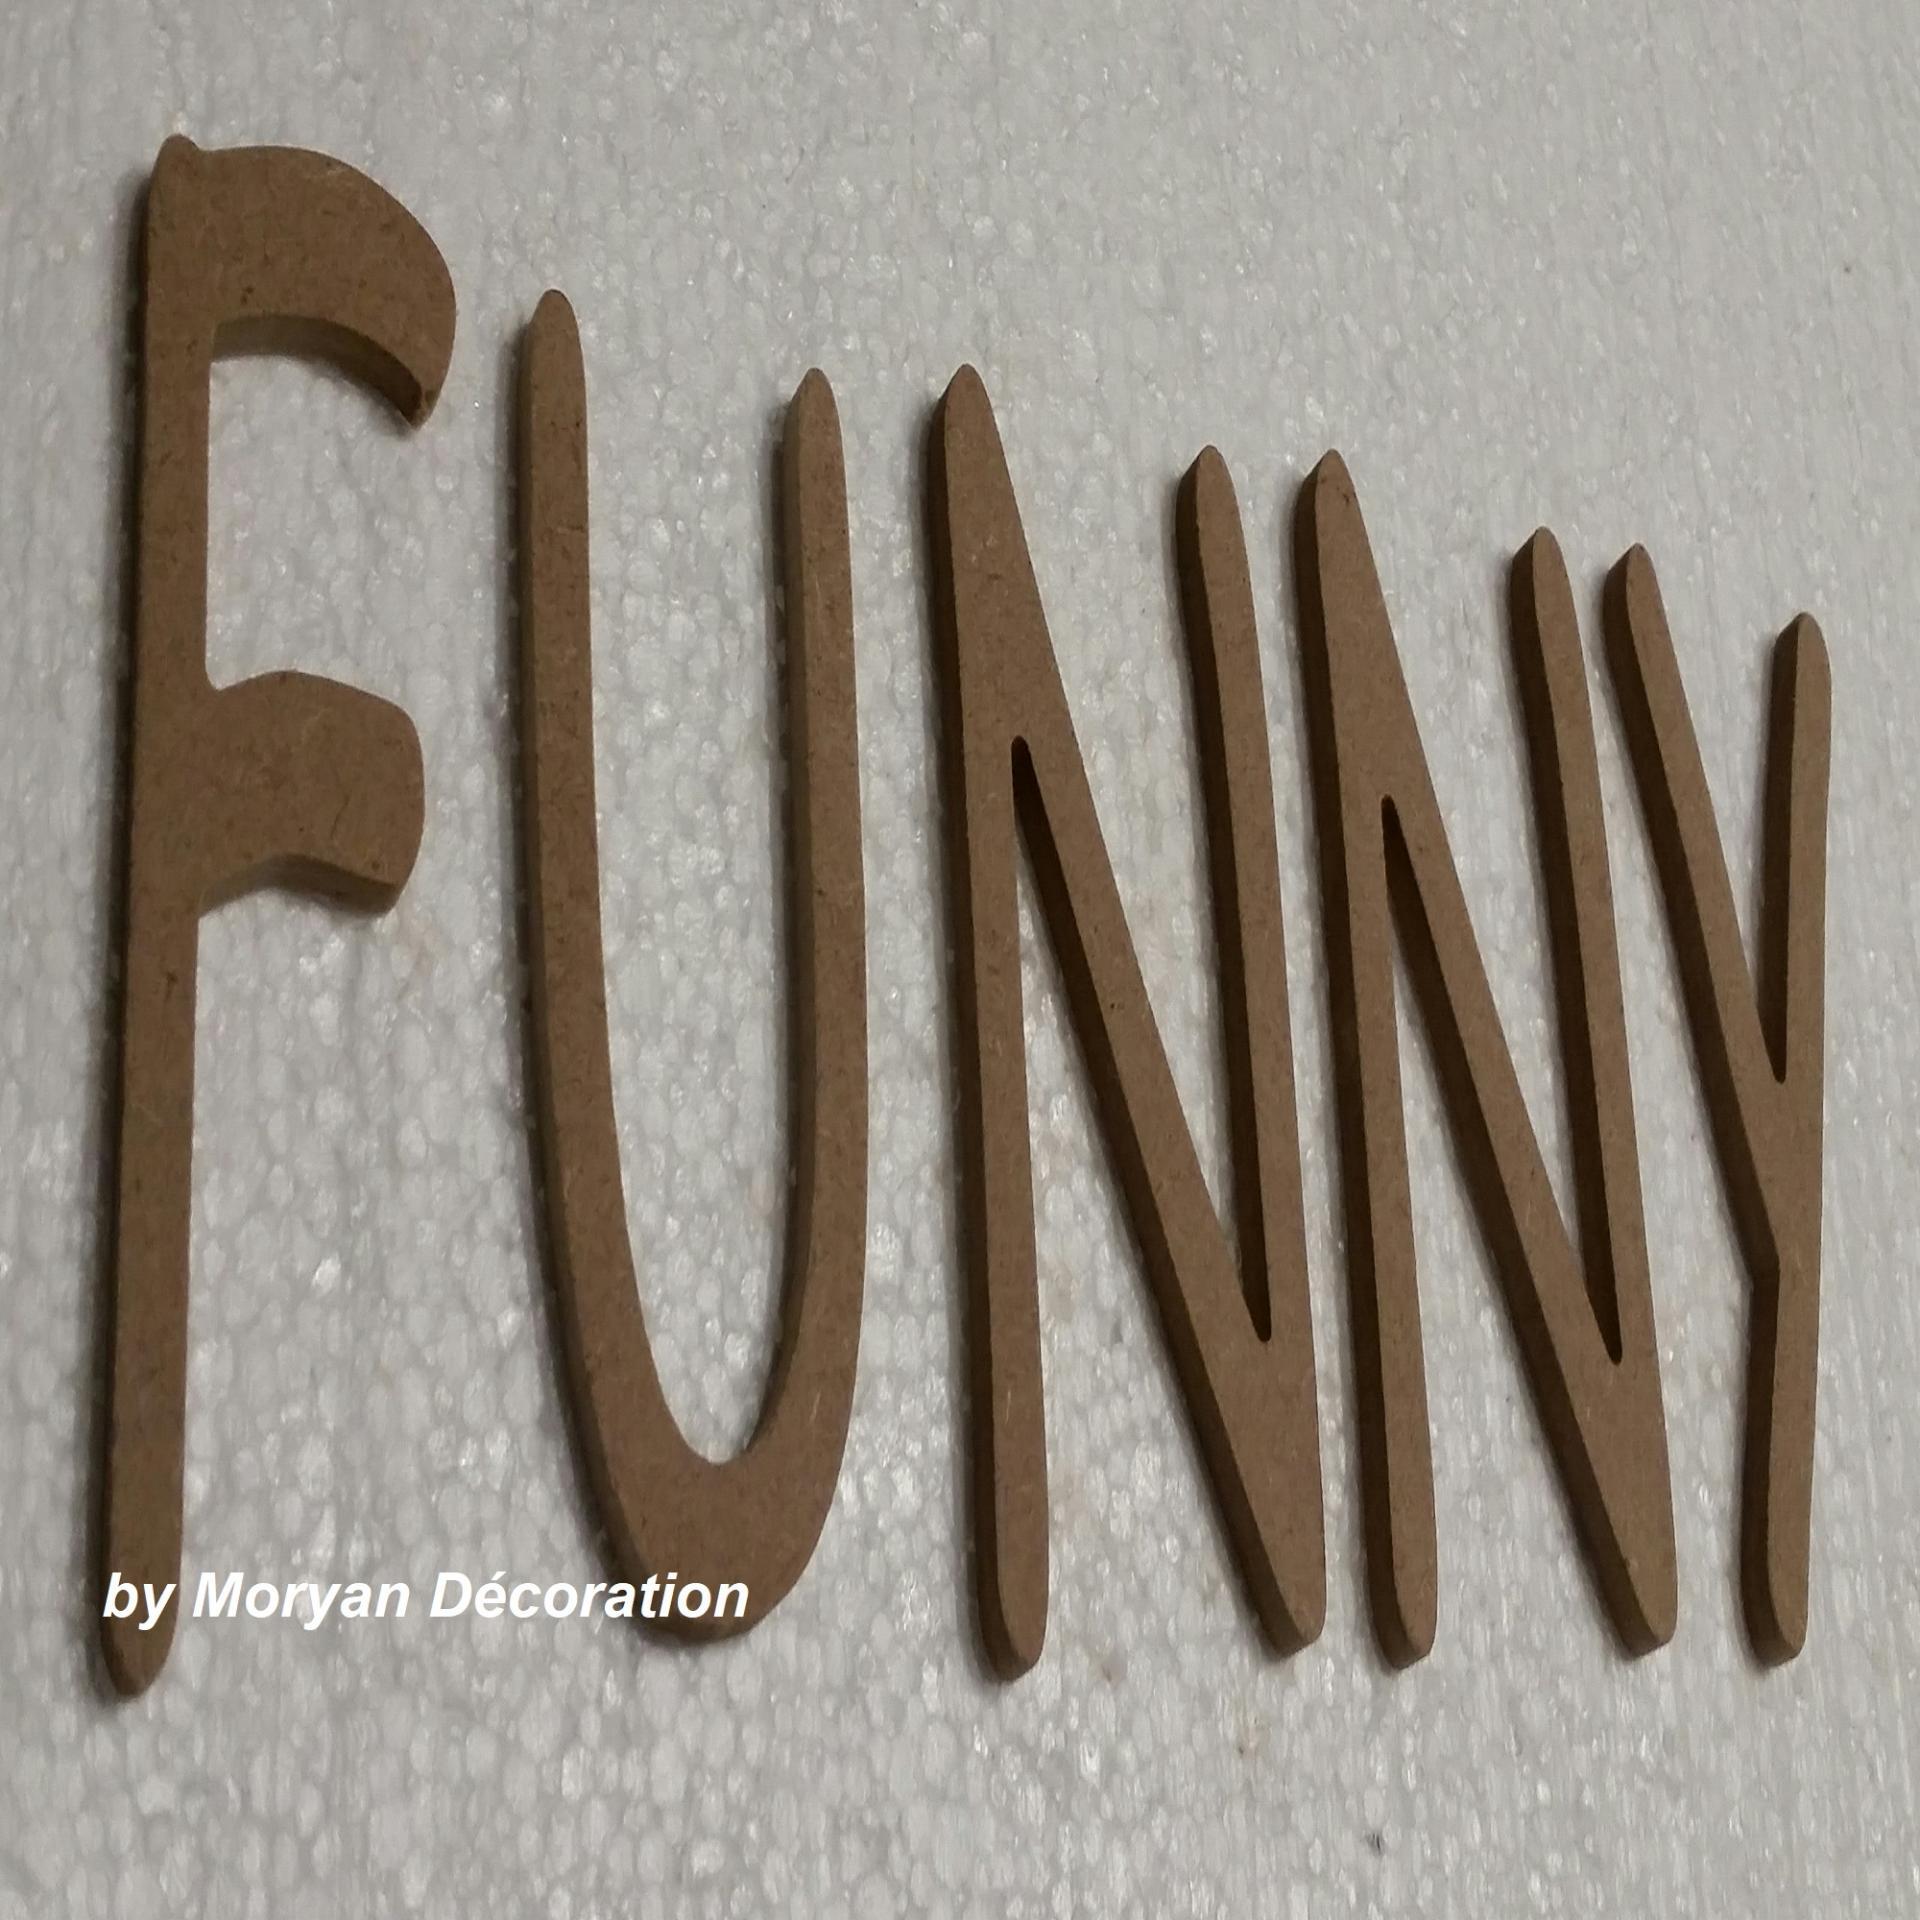 Lettre en bois funny 20 cm